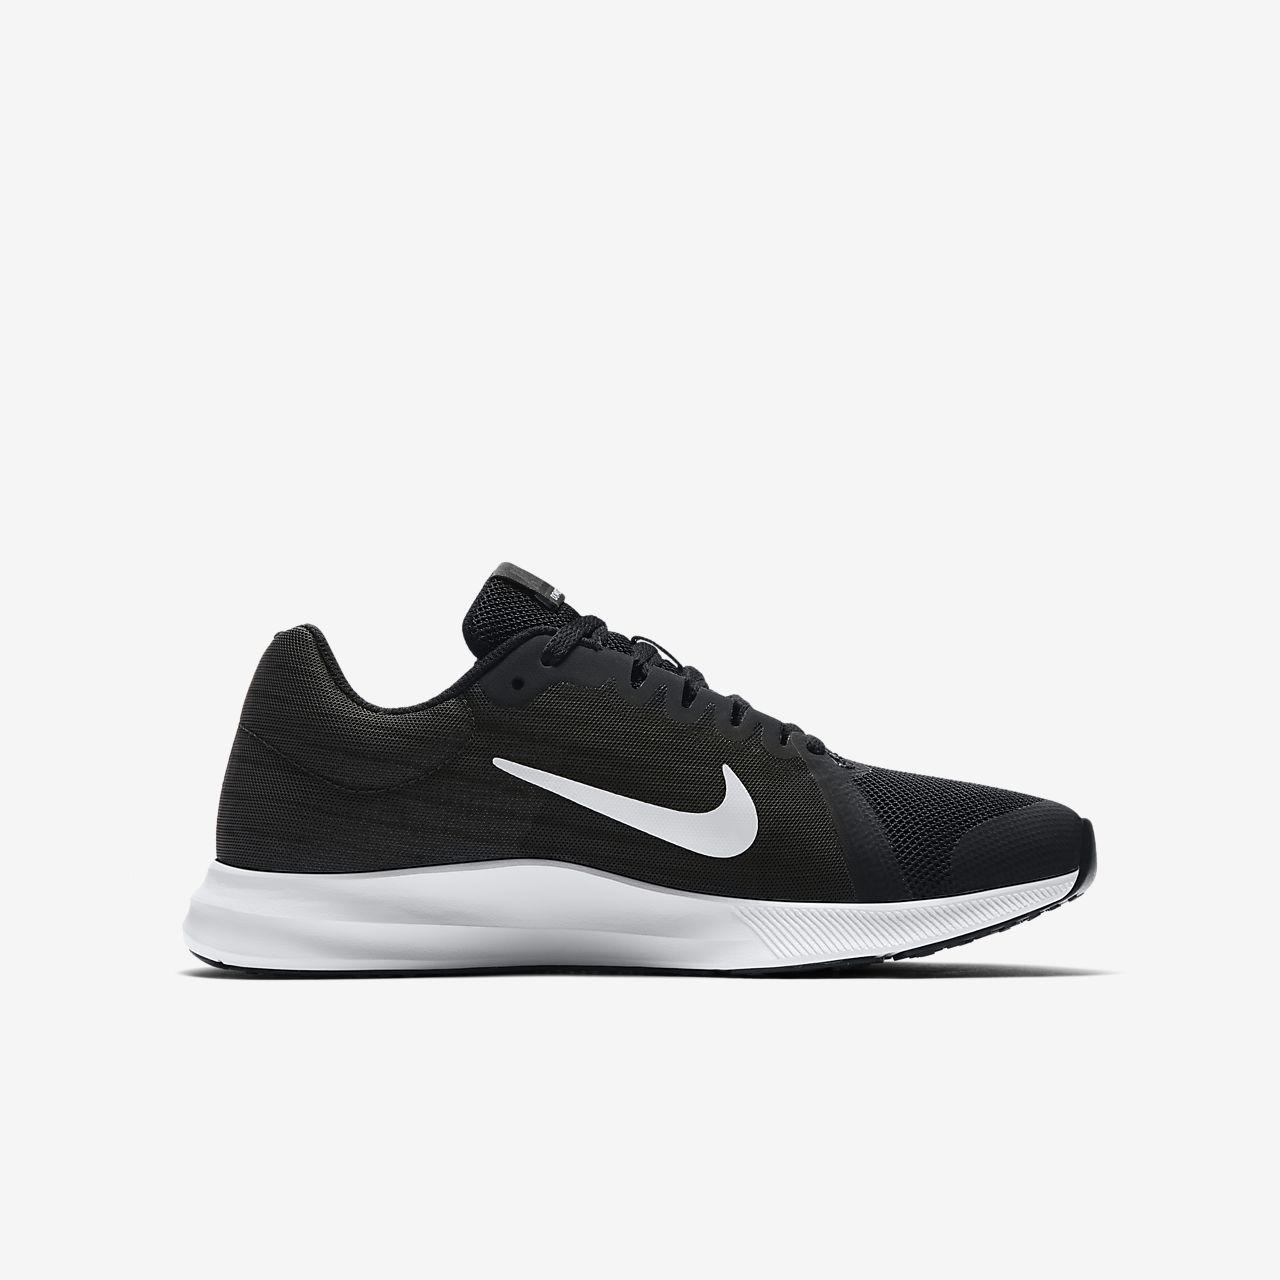 finest selection 27941 2a62b ... Chaussure de running Nike Downshifter 8 pour Garçon plus âgé